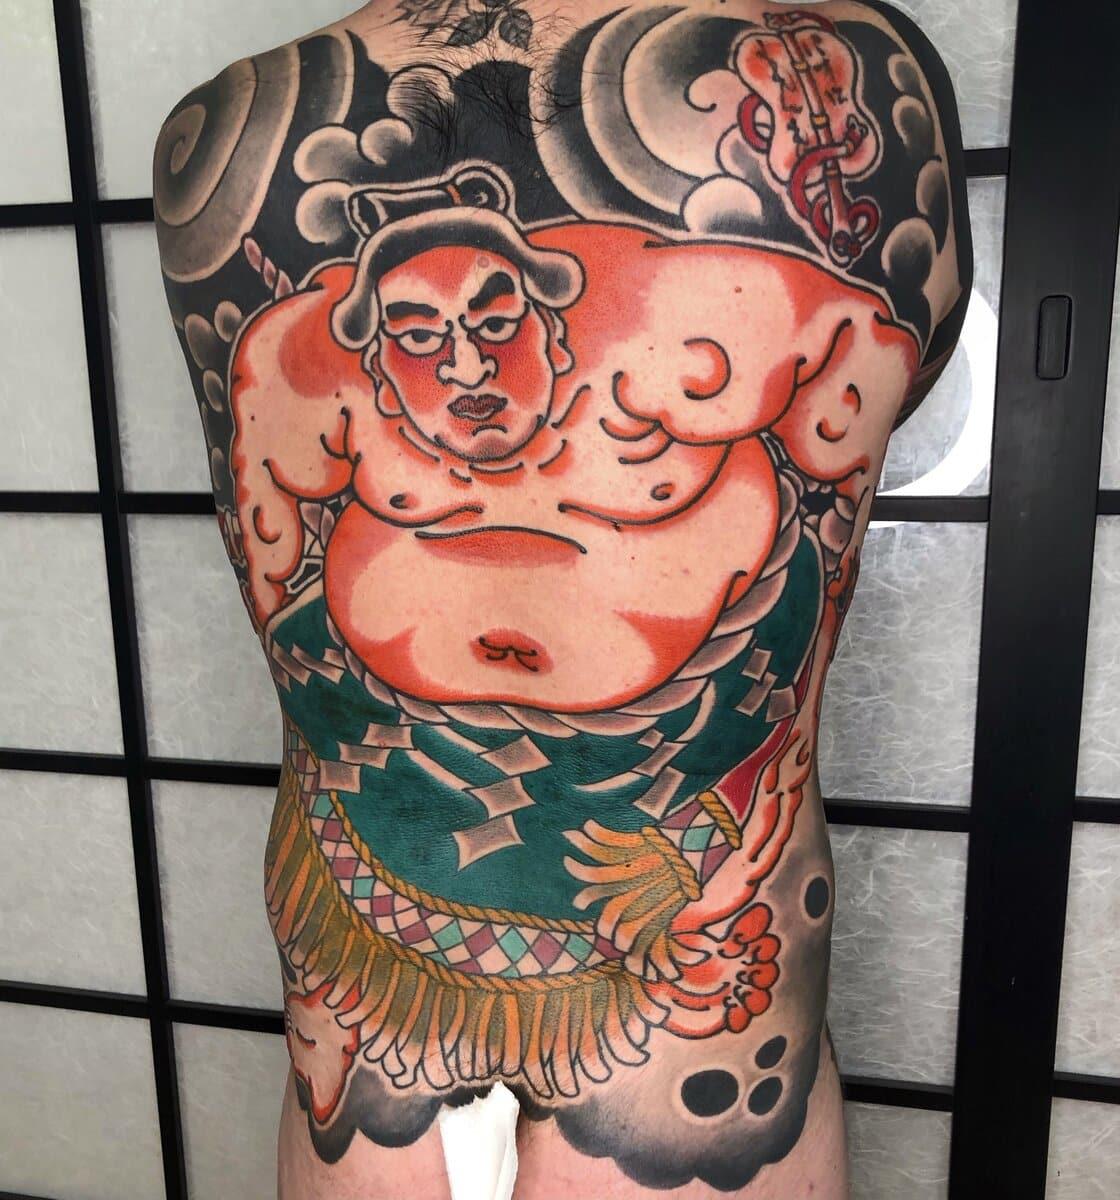 paolo-esse-tattoo-artist-back-sumo